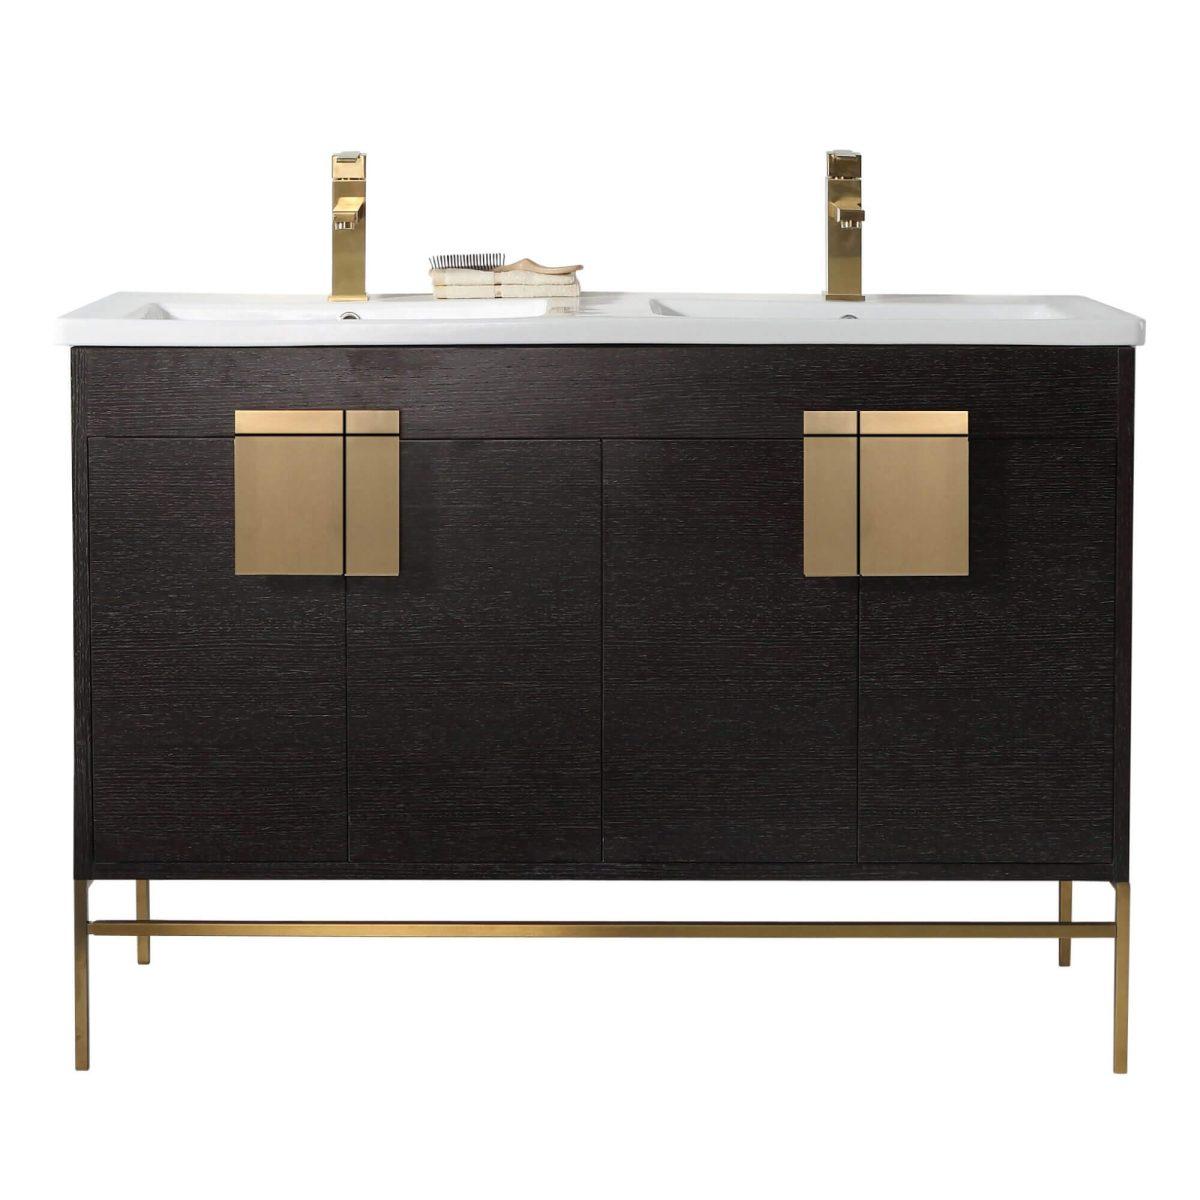 "Shawbridge 48"" Modern Double Bathroom Vanity  Black Oak Straight Grain with Satin Brass Hardware"